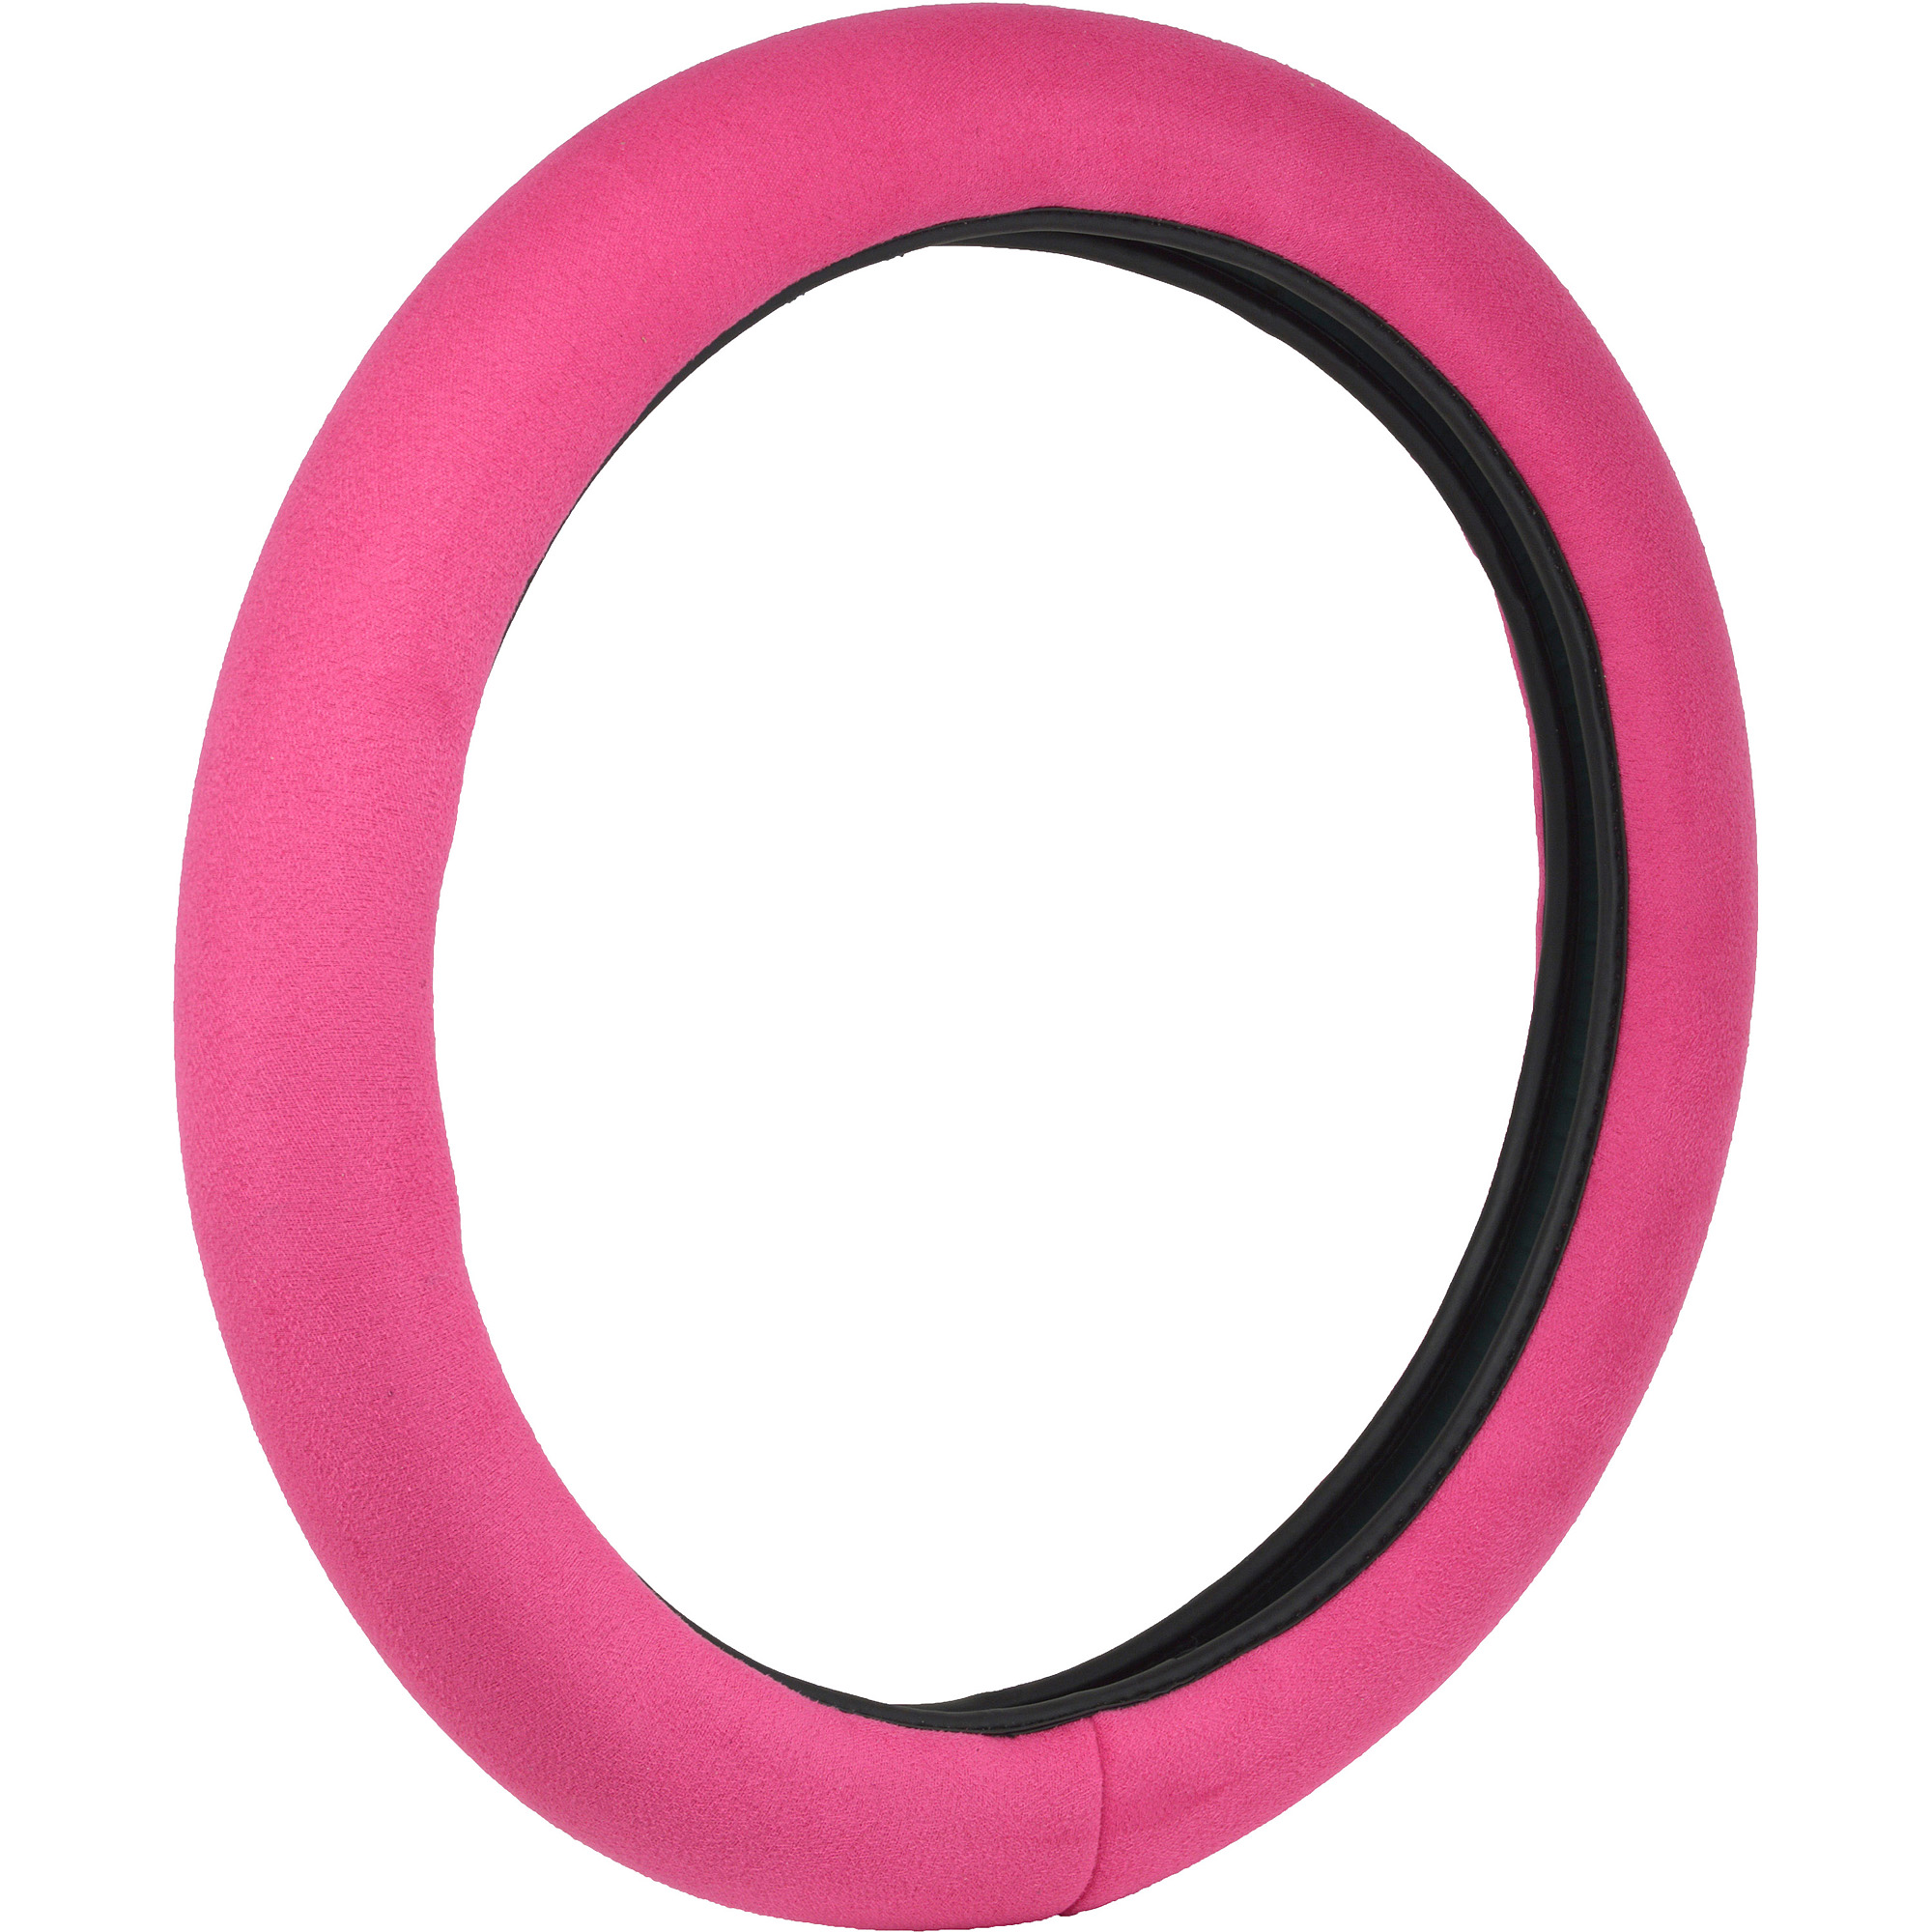 Bell Automotive Pink Stress Releiver Hyper-Flex Core Steering Wheel Cover